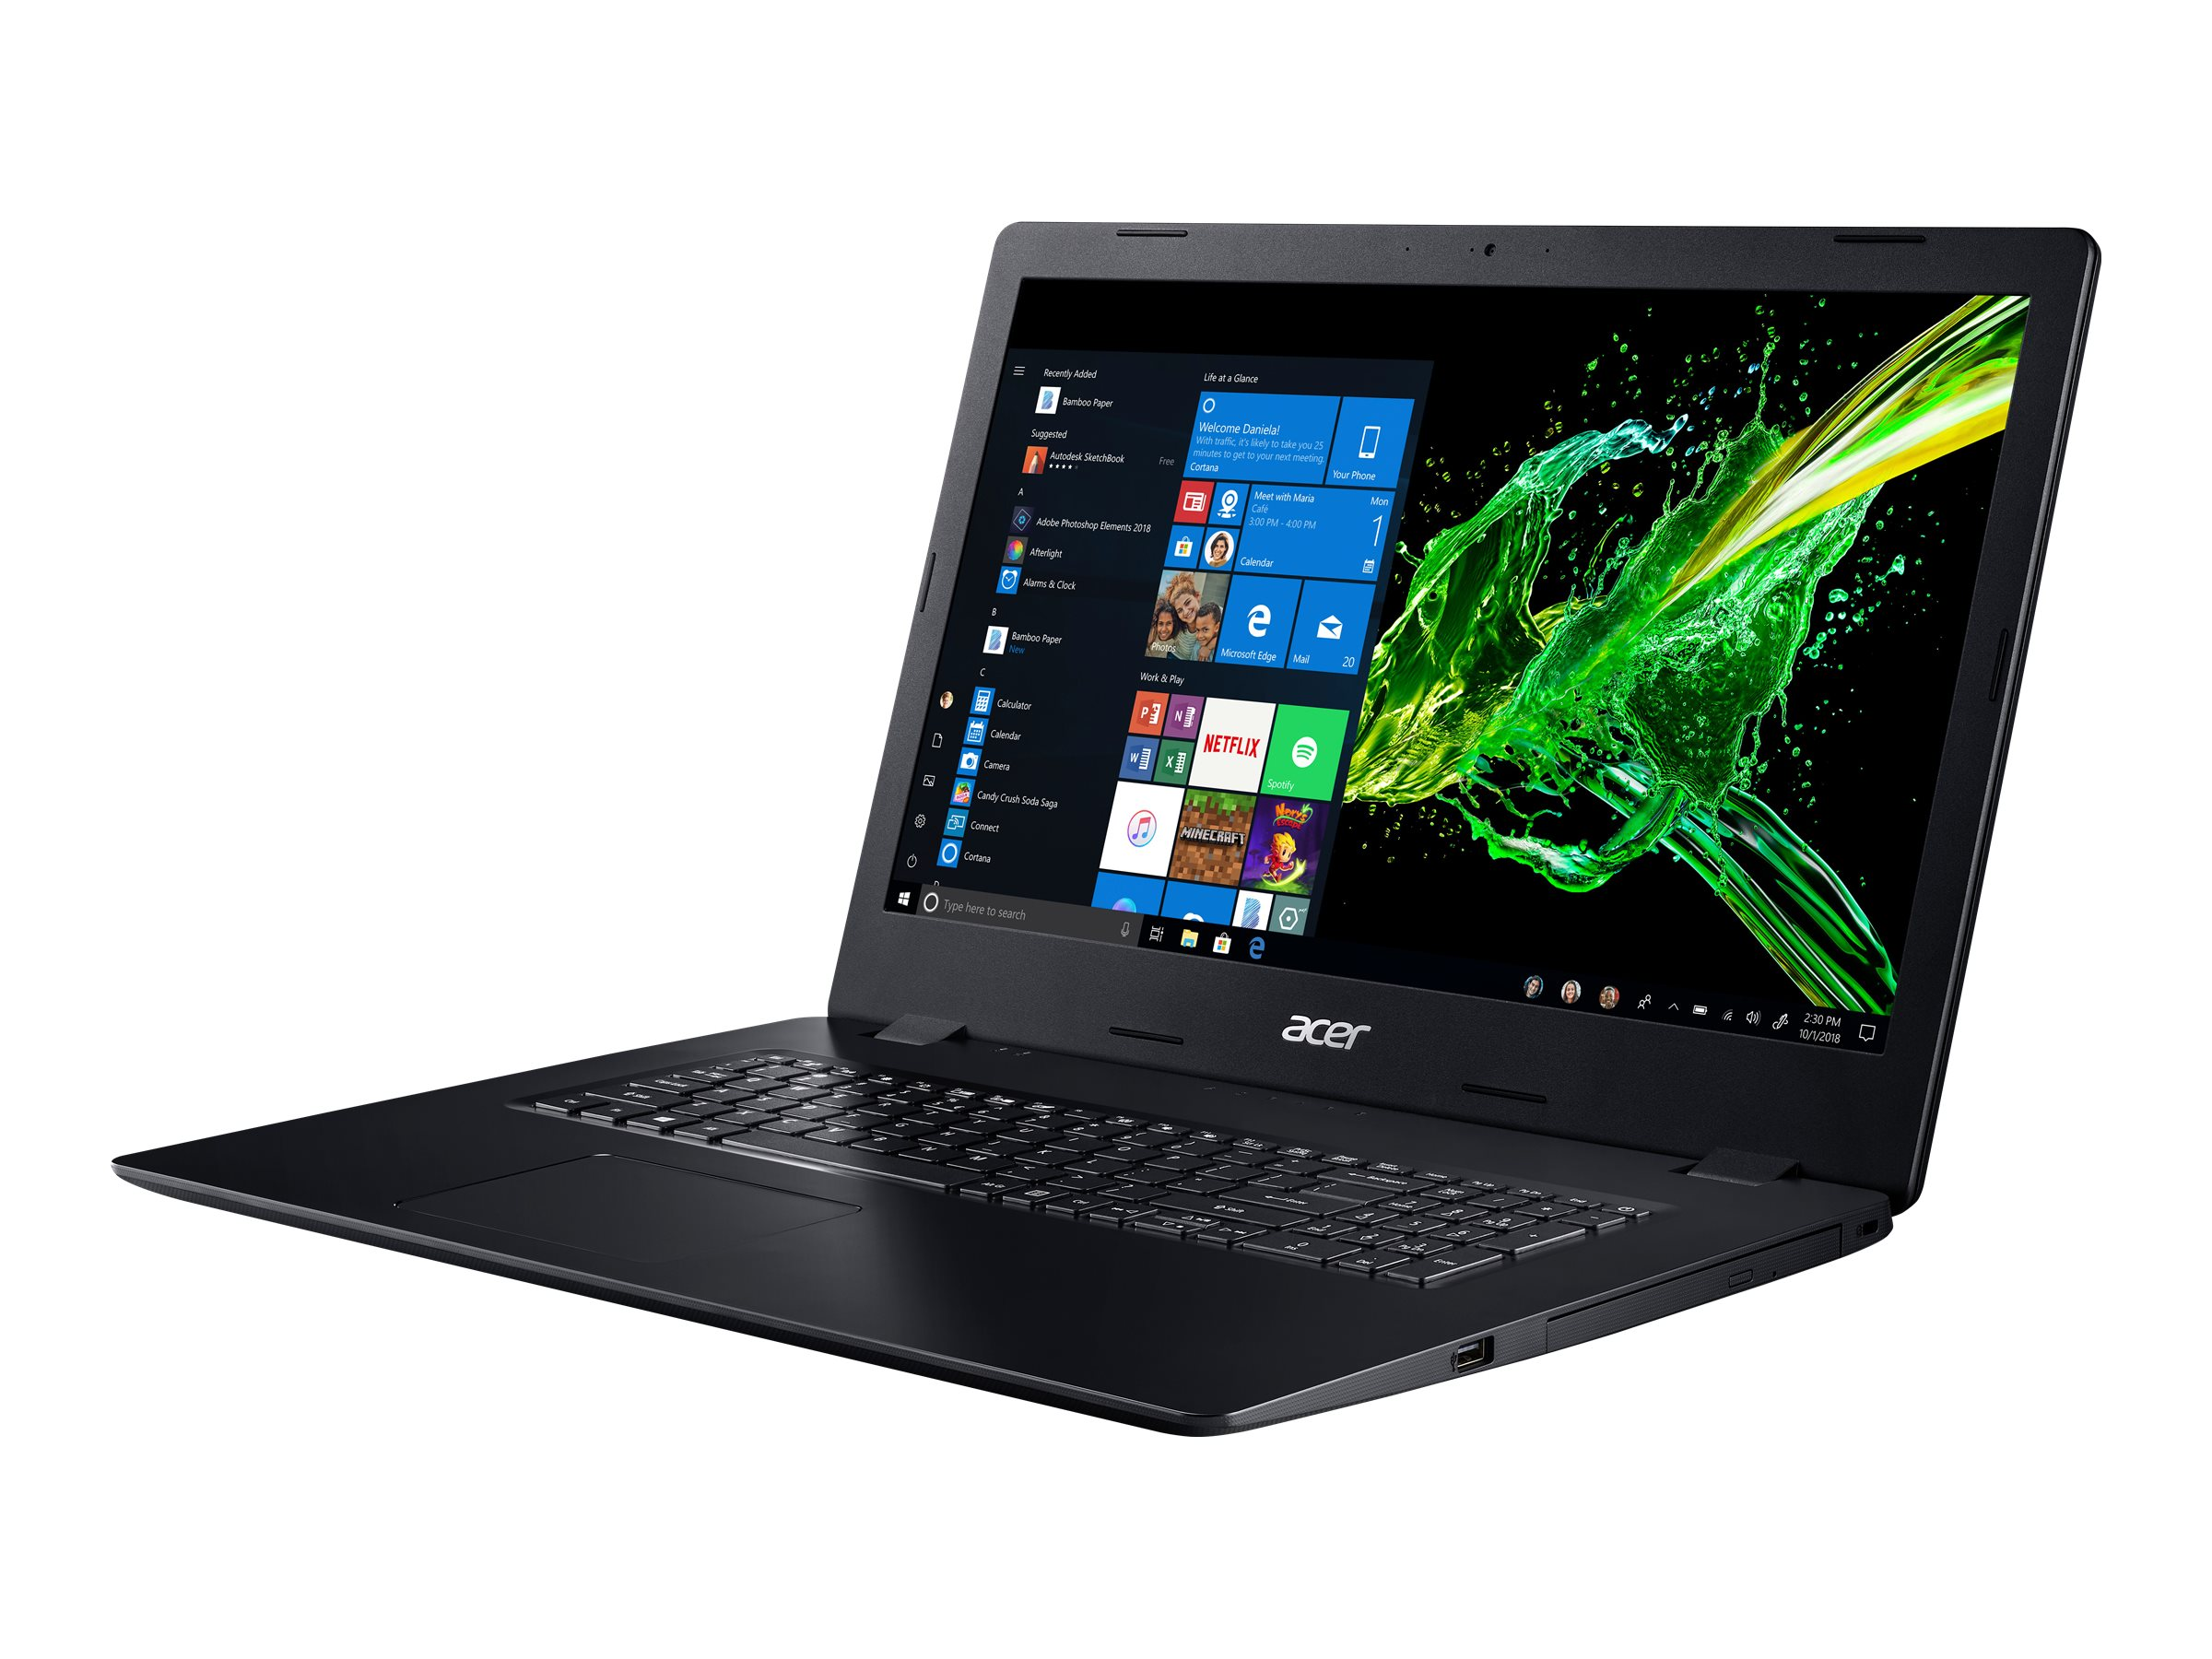 "Acer Aspire 3 A317-51G-577H - Core i5 10210U / 1.6 GHz - ESHELL - 8 GB RAM - 512 GB SSD - DVD-Writer - 43.94 cm (17.3"")"